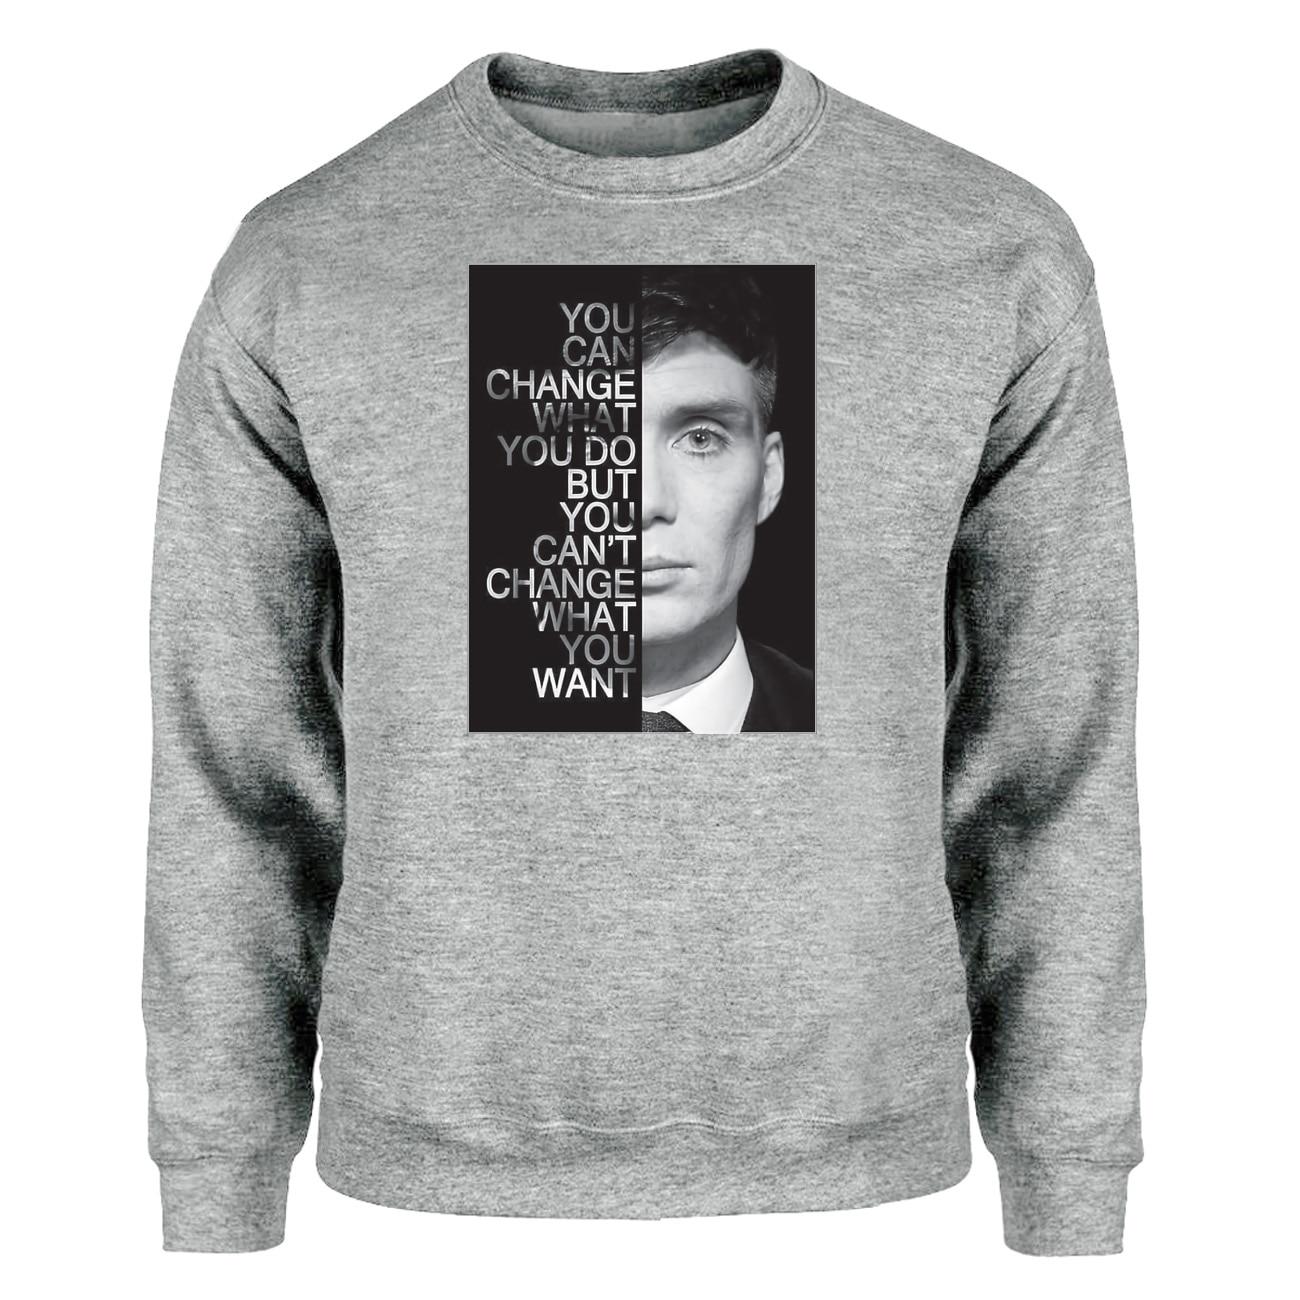 Peaky Blinders Hoodies Men Sweatshirts TV Show Crewneck Sweatshirt Hoodie 2019 Hipster Winter Autumn Fleece Warm Sportswear